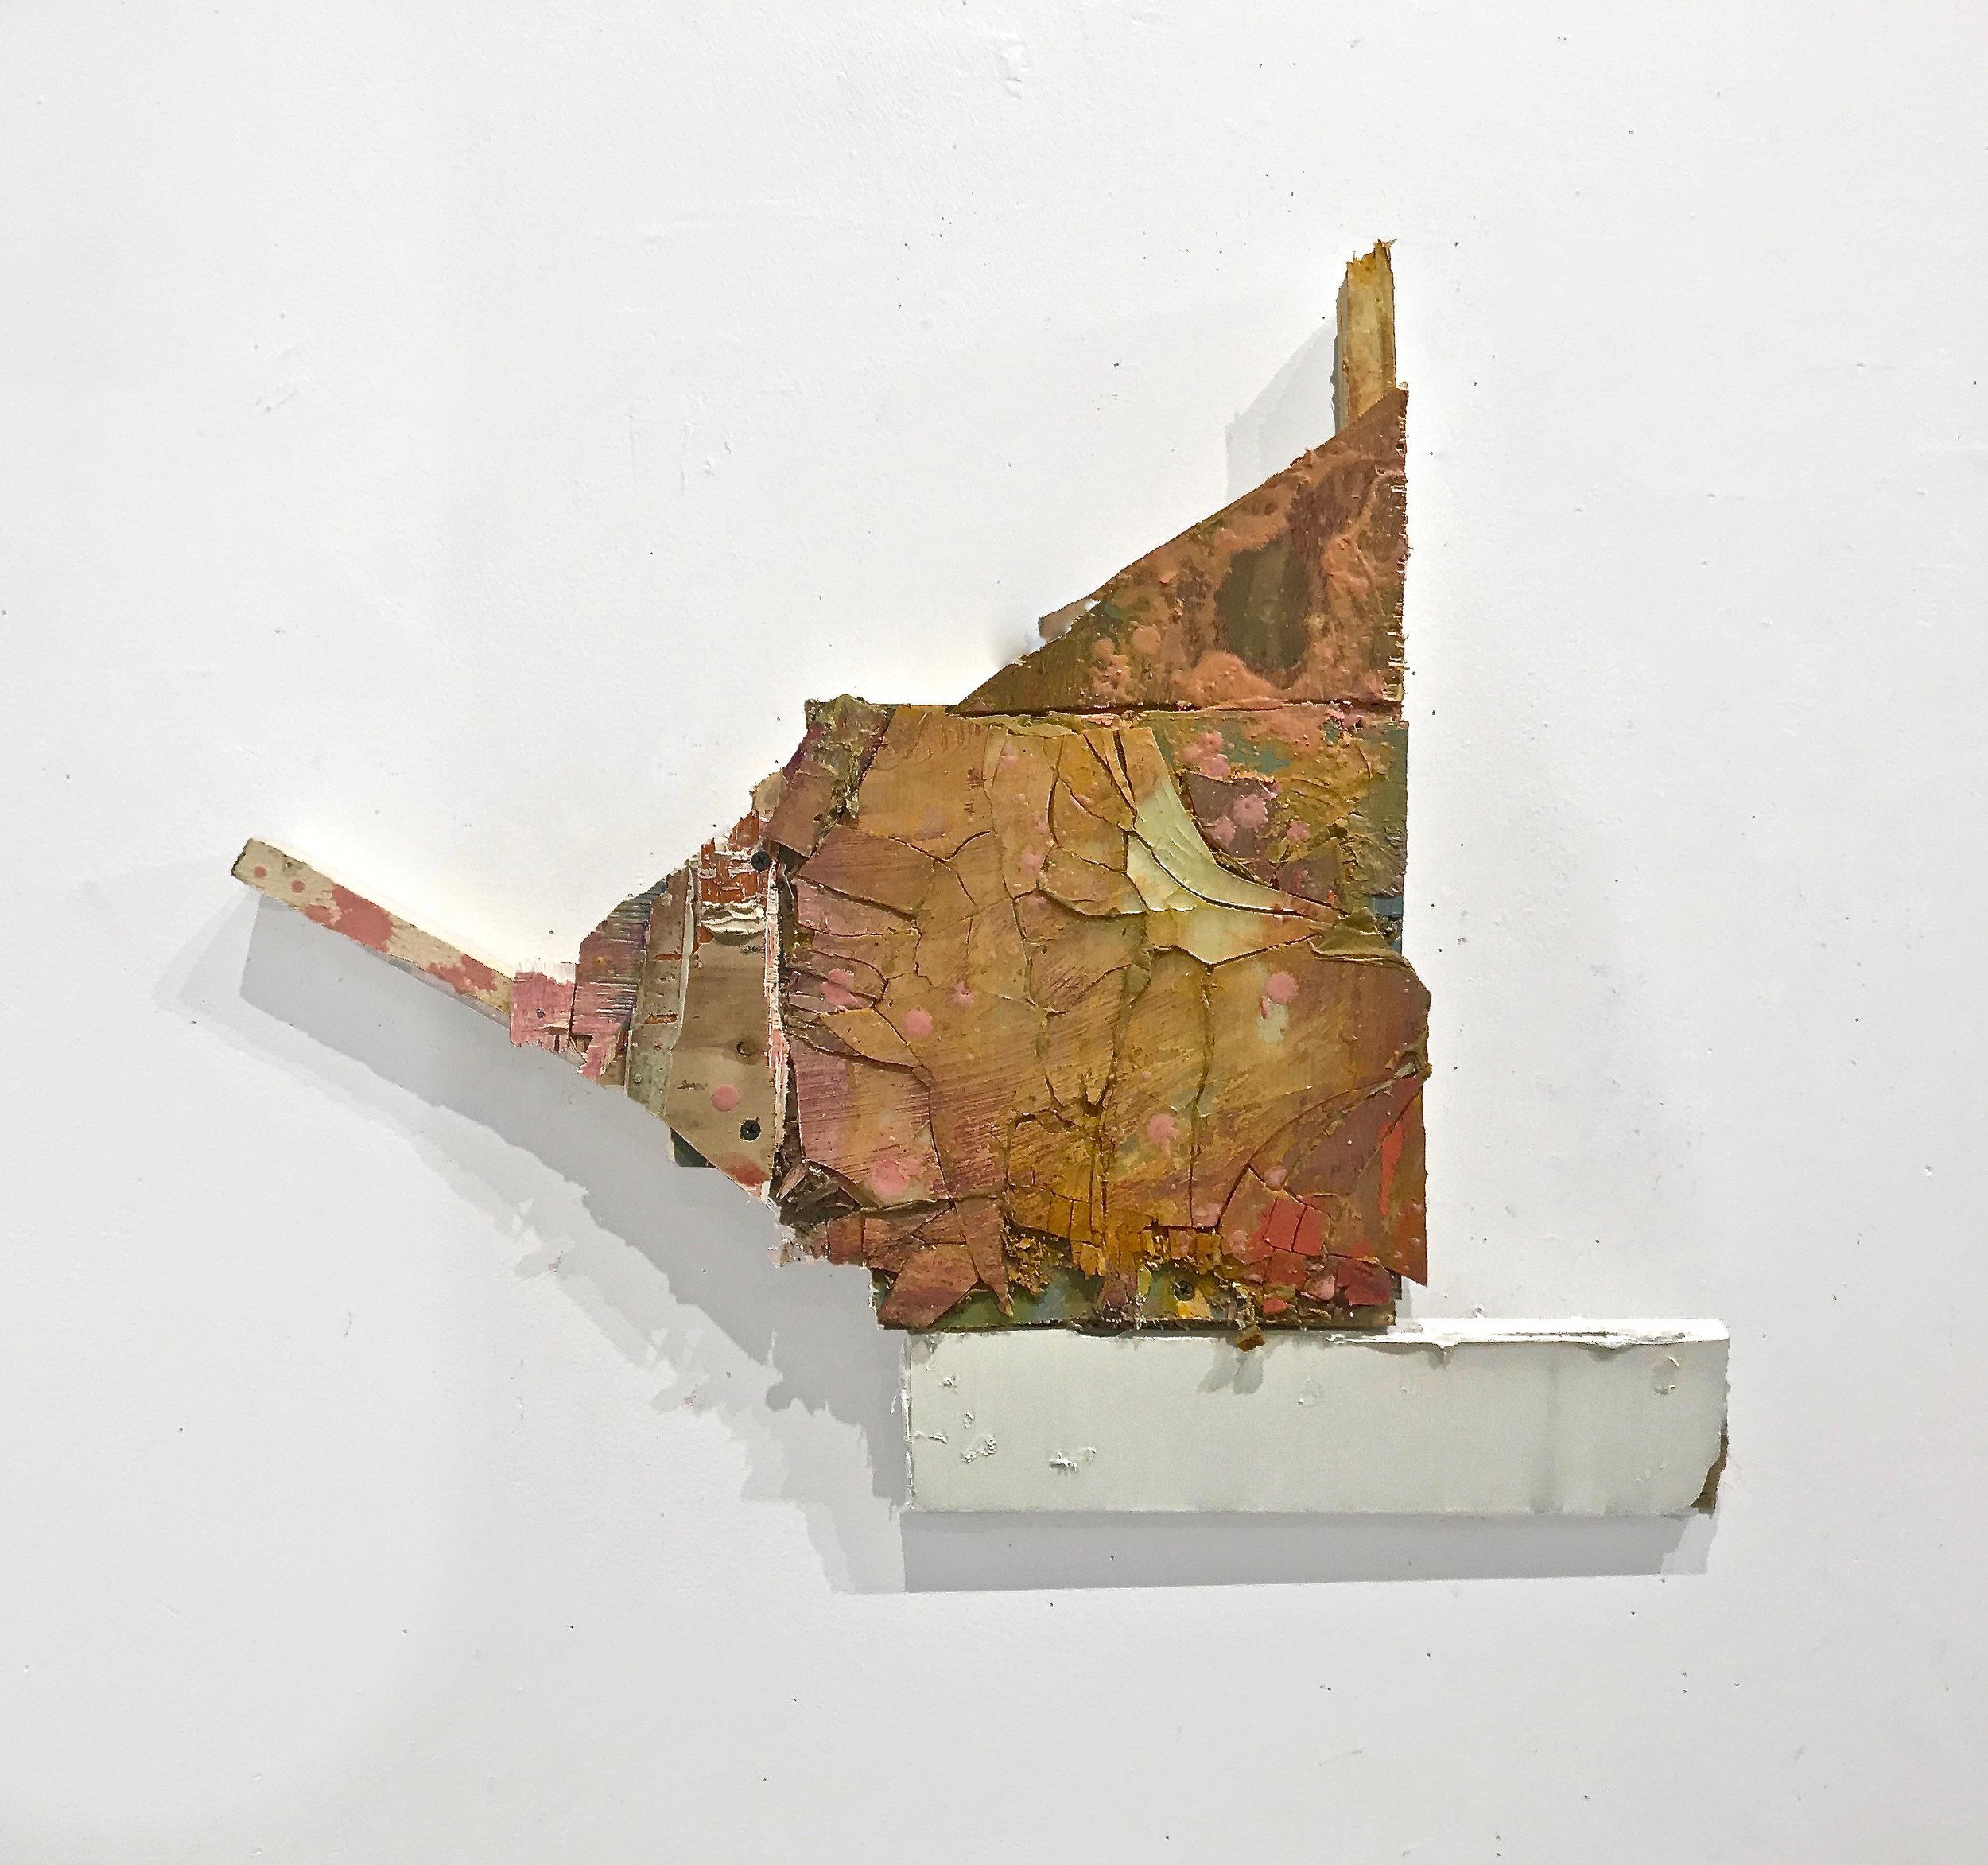 DanieljohnGadd-Chomp copy.jpg